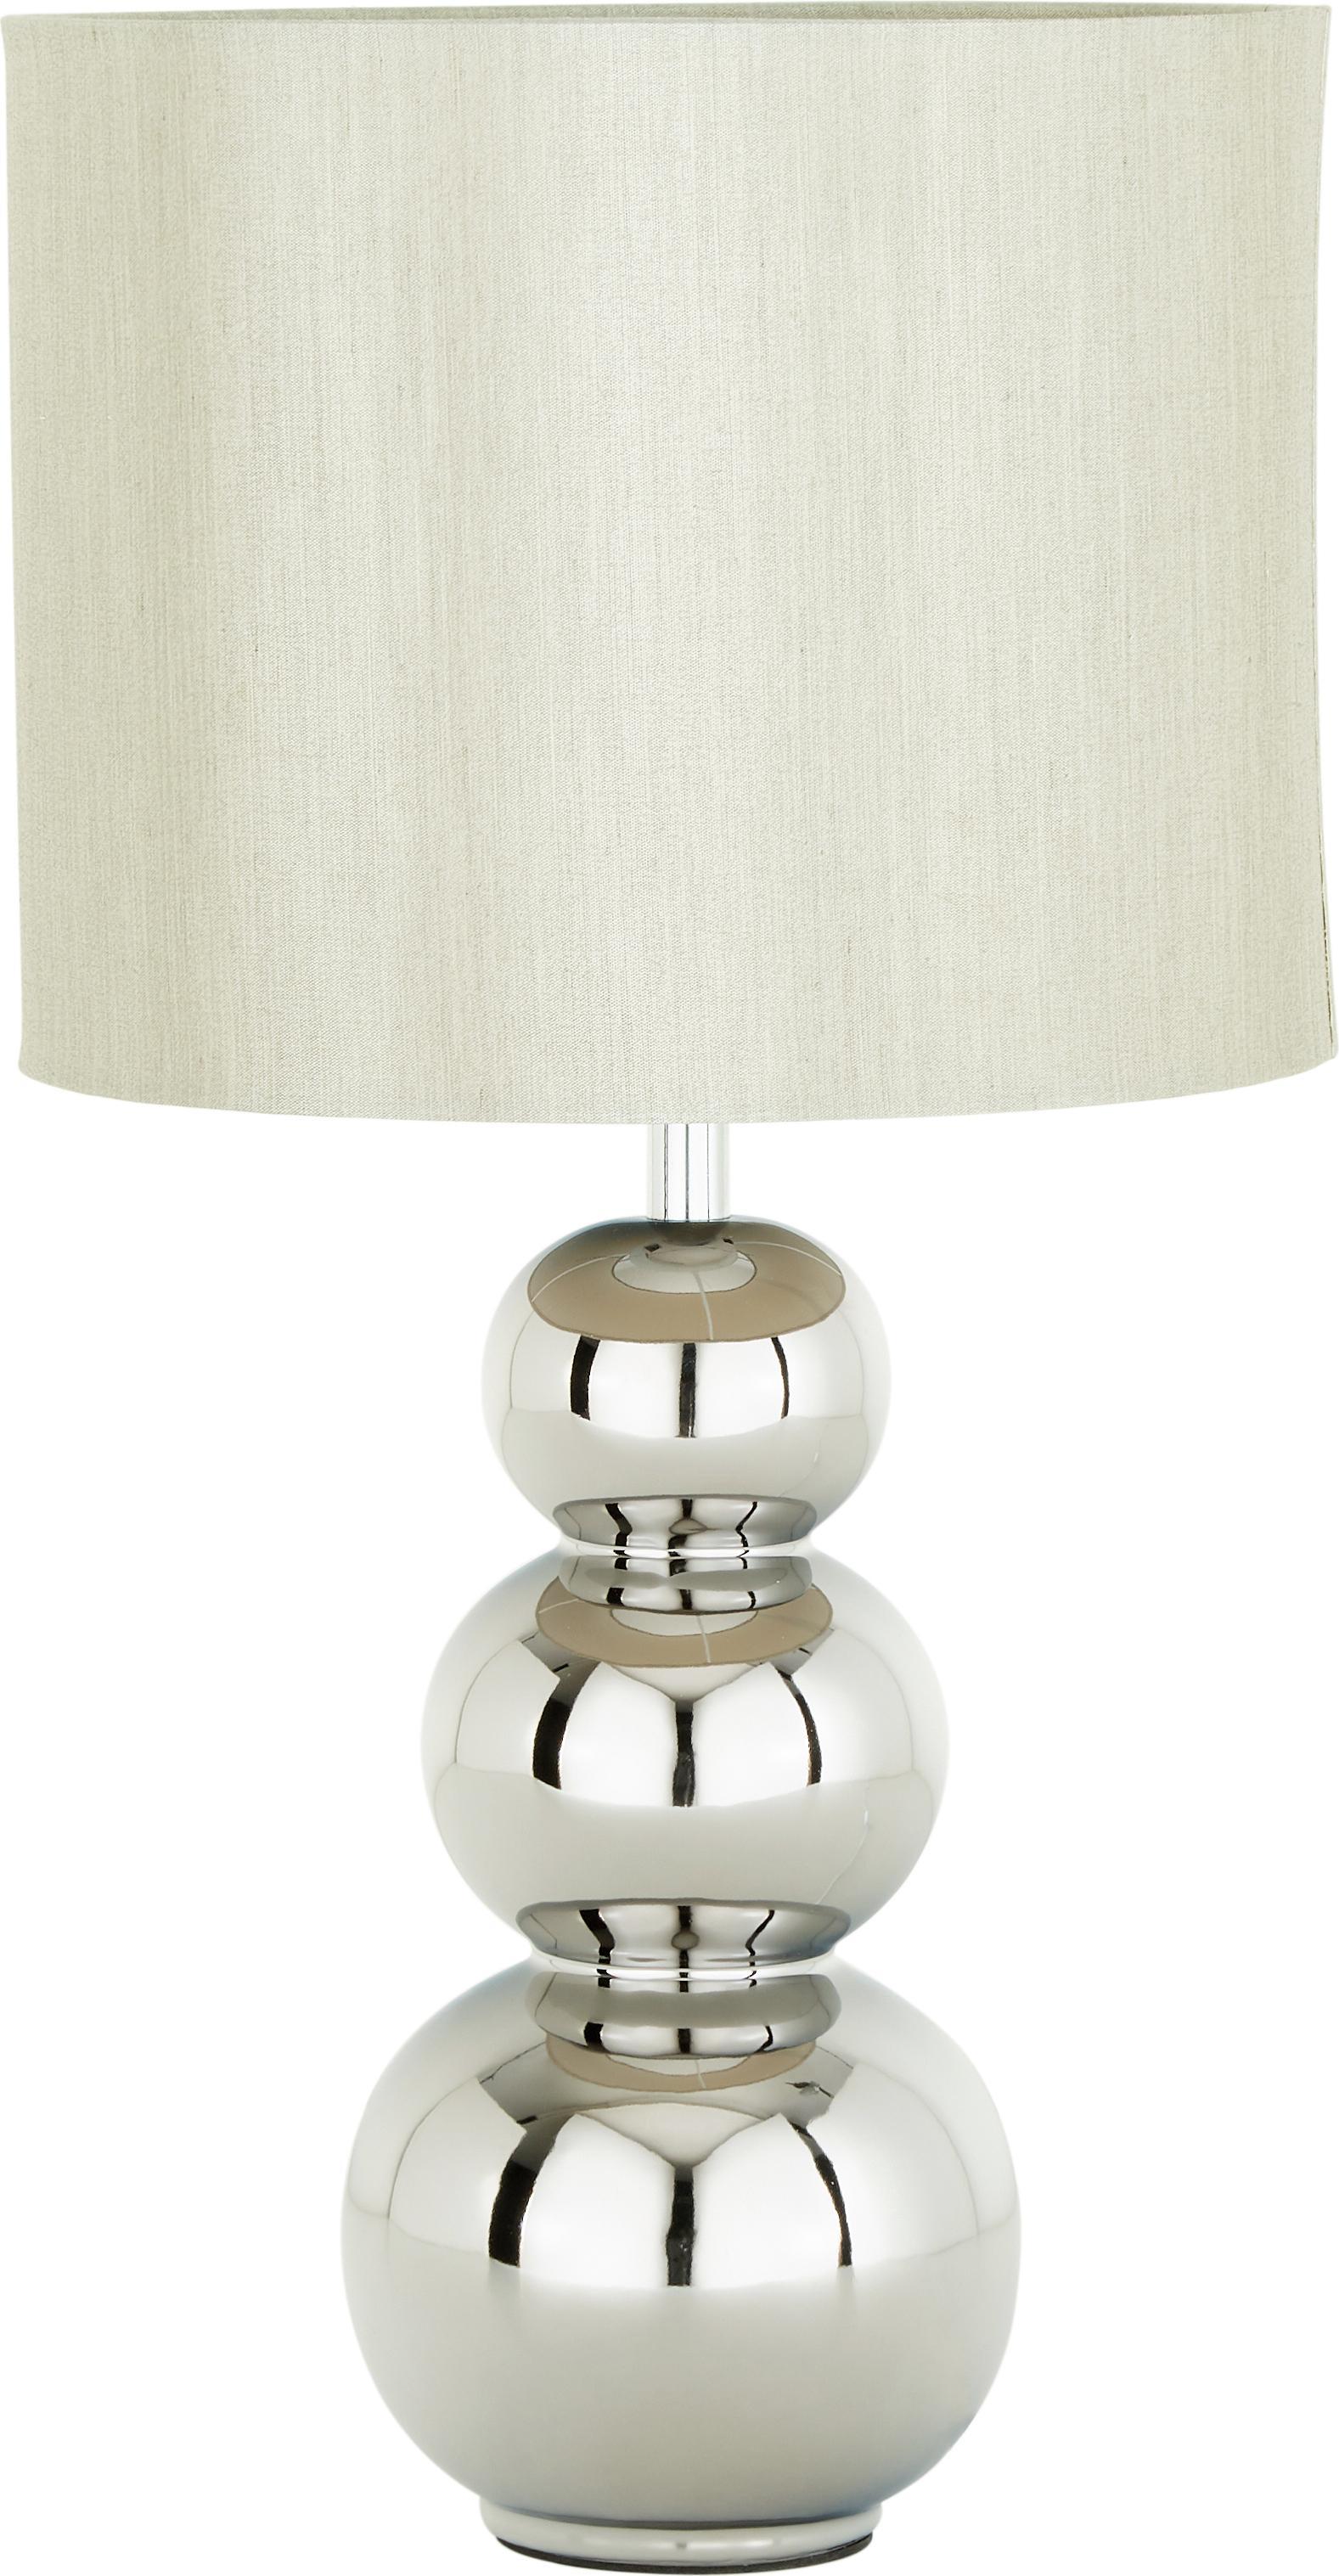 Lampada da tavolo Regina, Paralume: tessuto, Base della lampada: ceramica, Taupe, cromo, Ø 25 x Alt. 49 cm